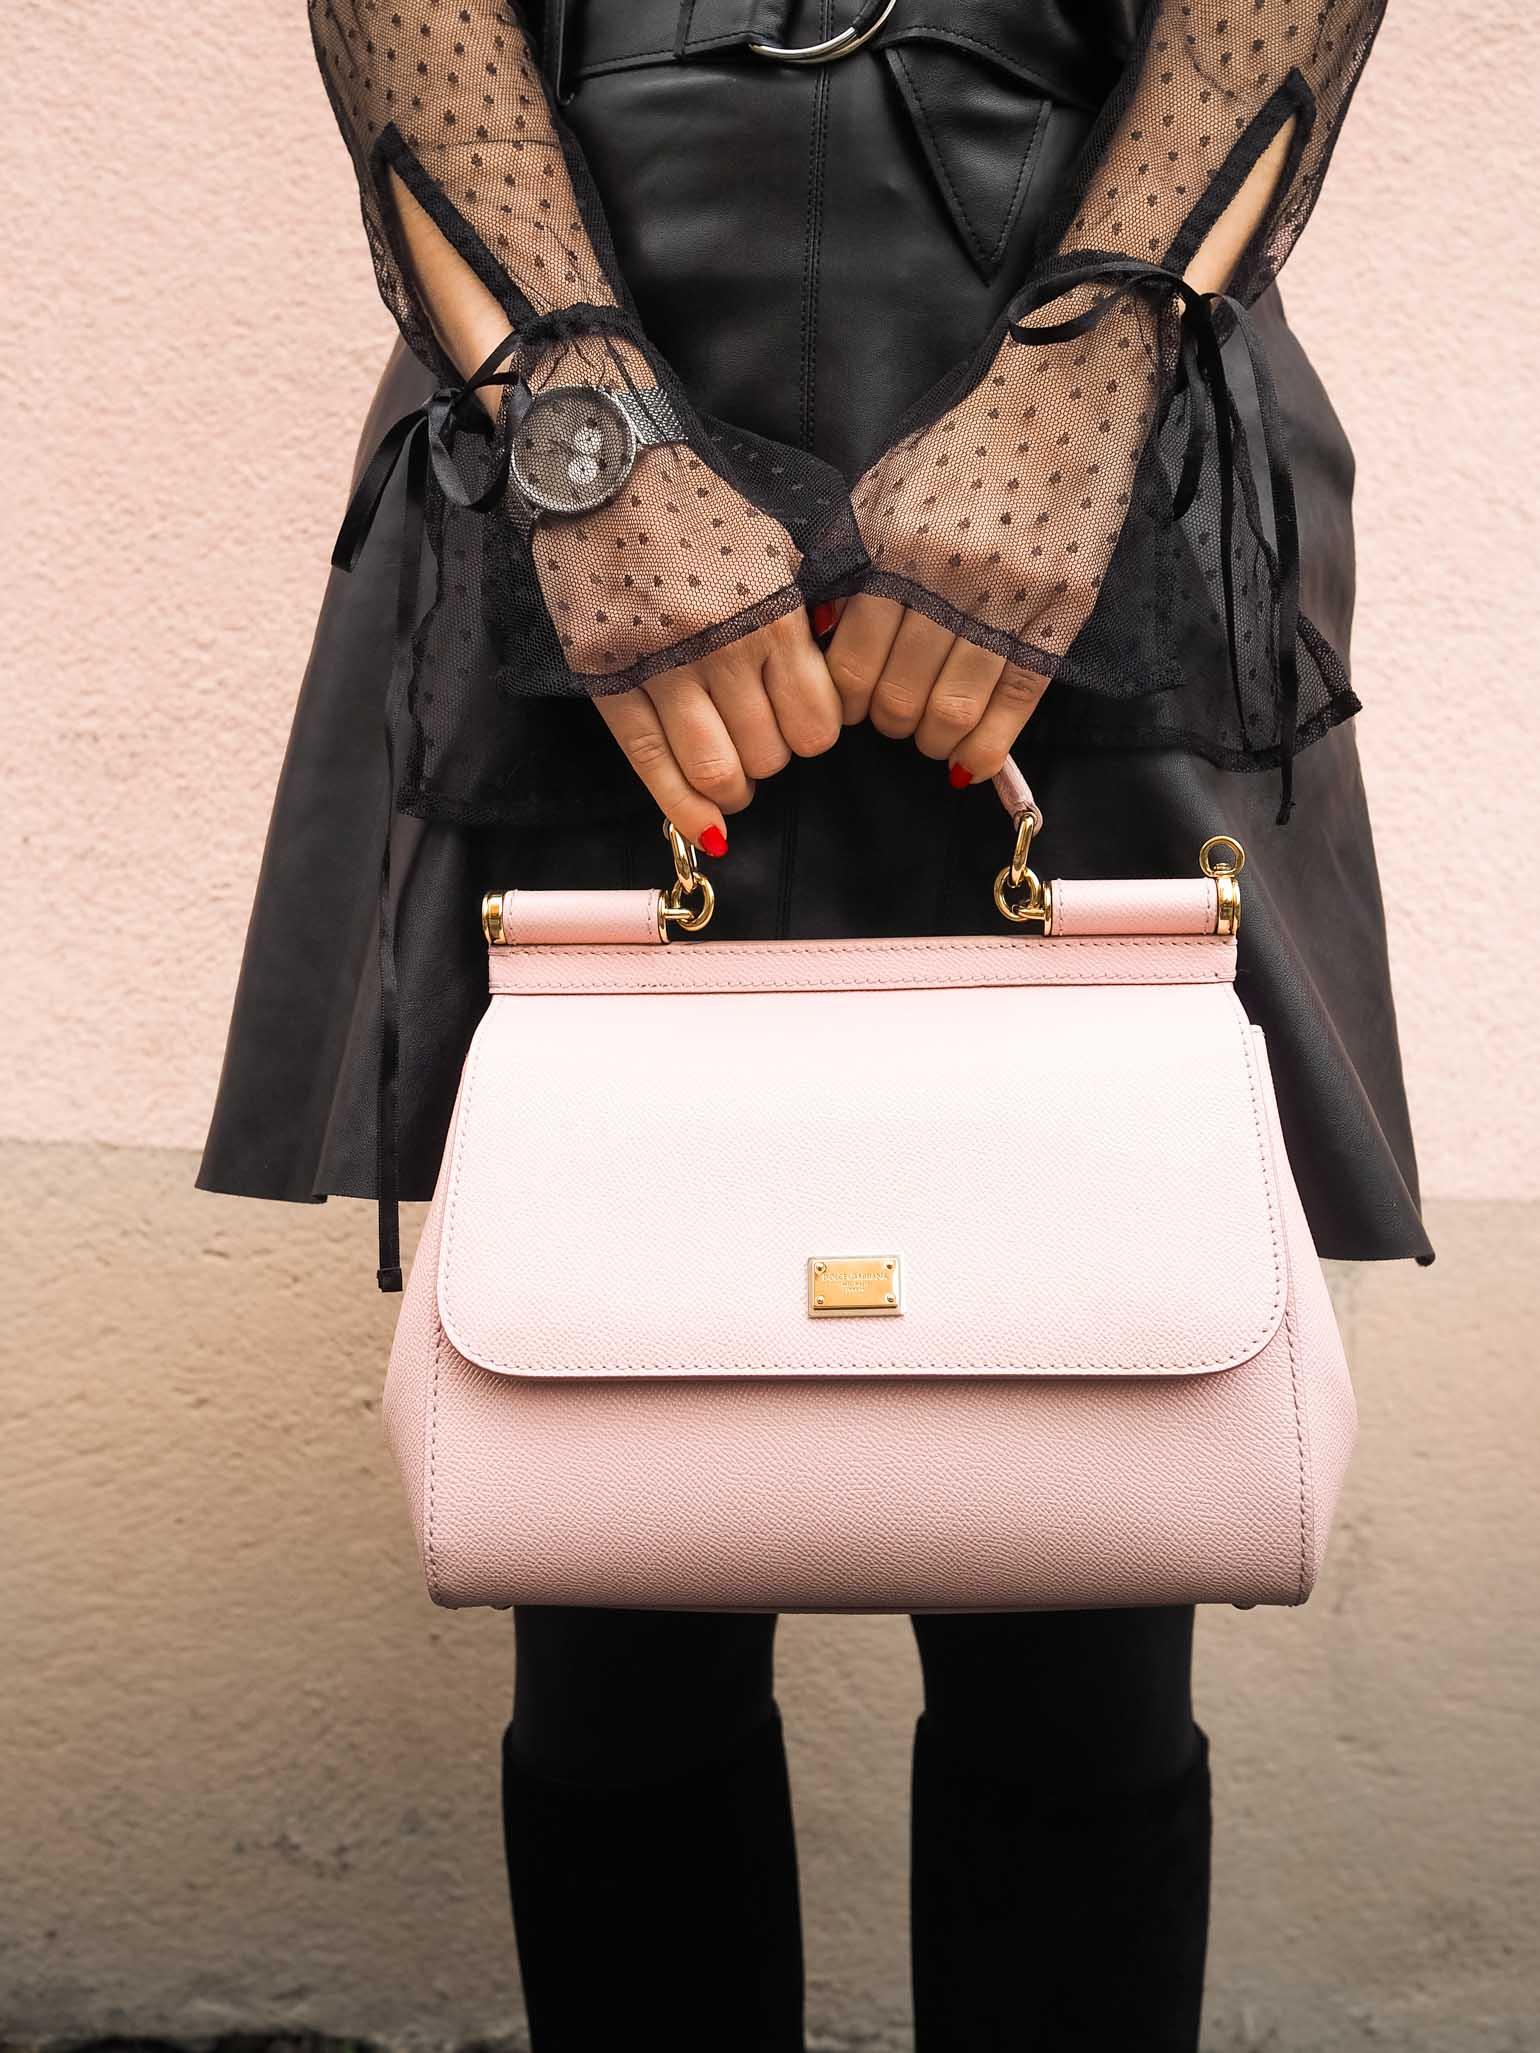 All Black Look, Holiday Look, Dolce & Gabbana Handbag - The Brunette Nomad